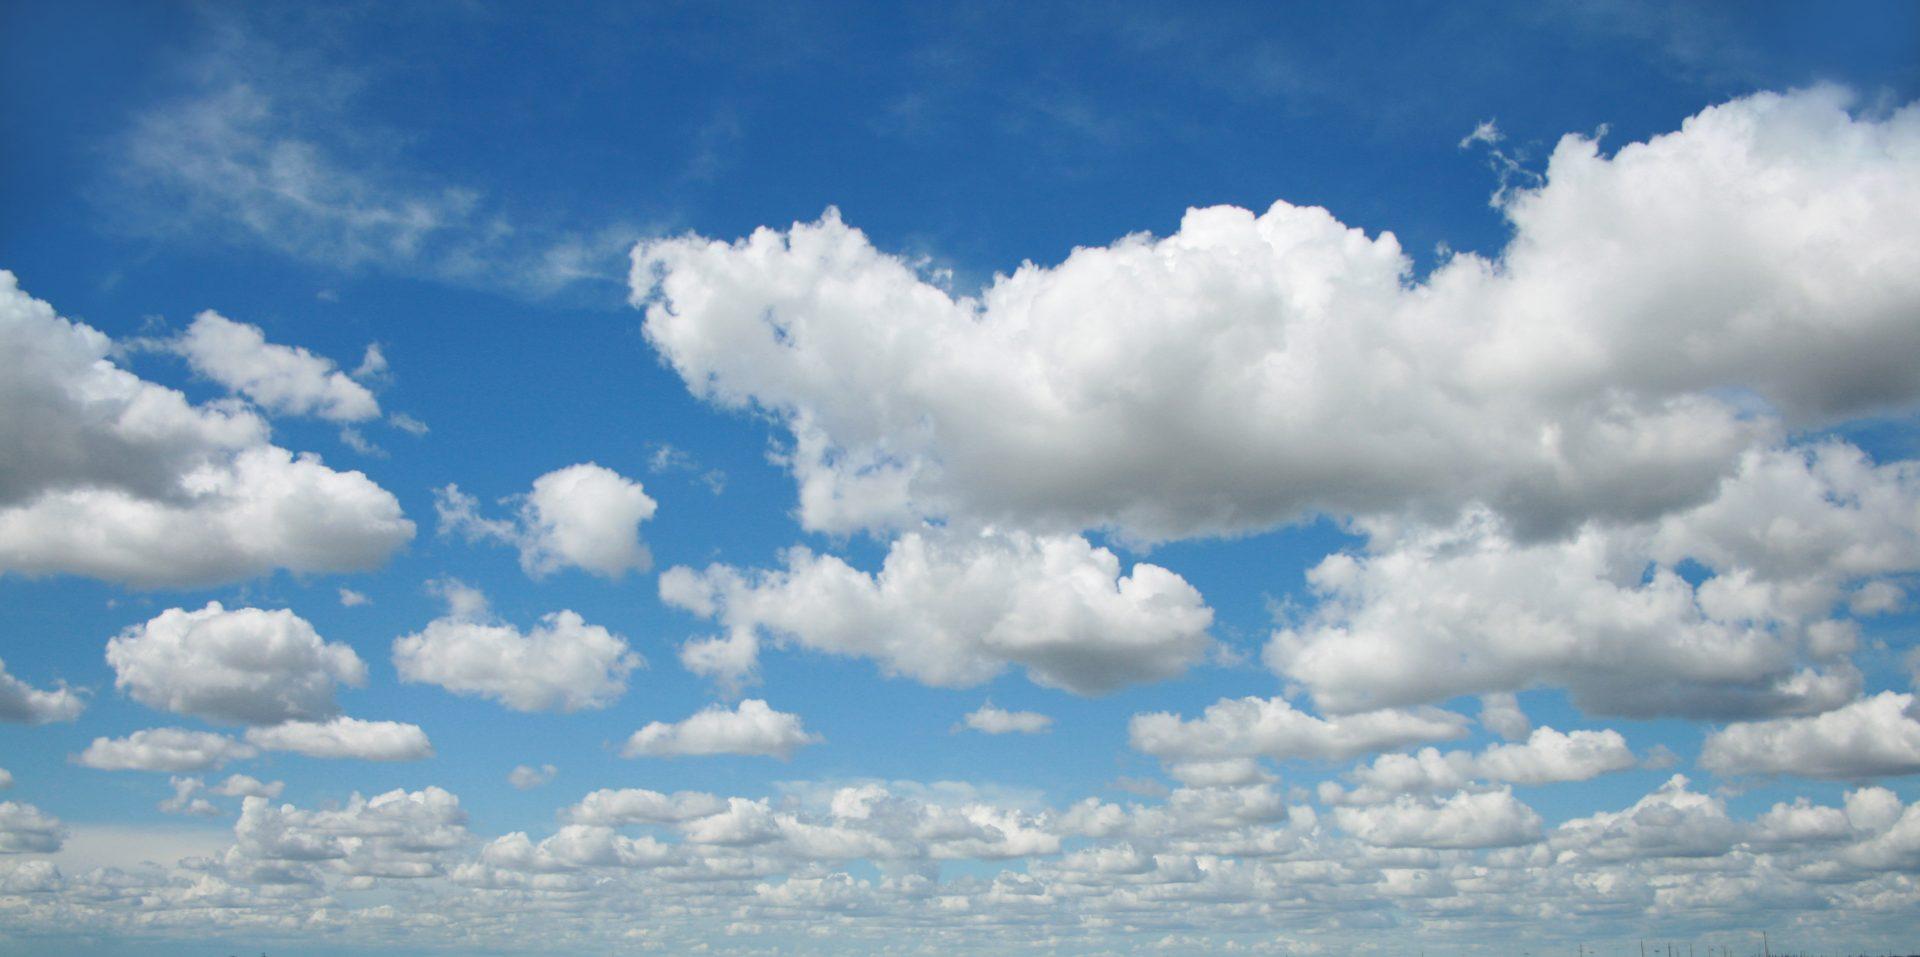 Cloud Background 3888x1938